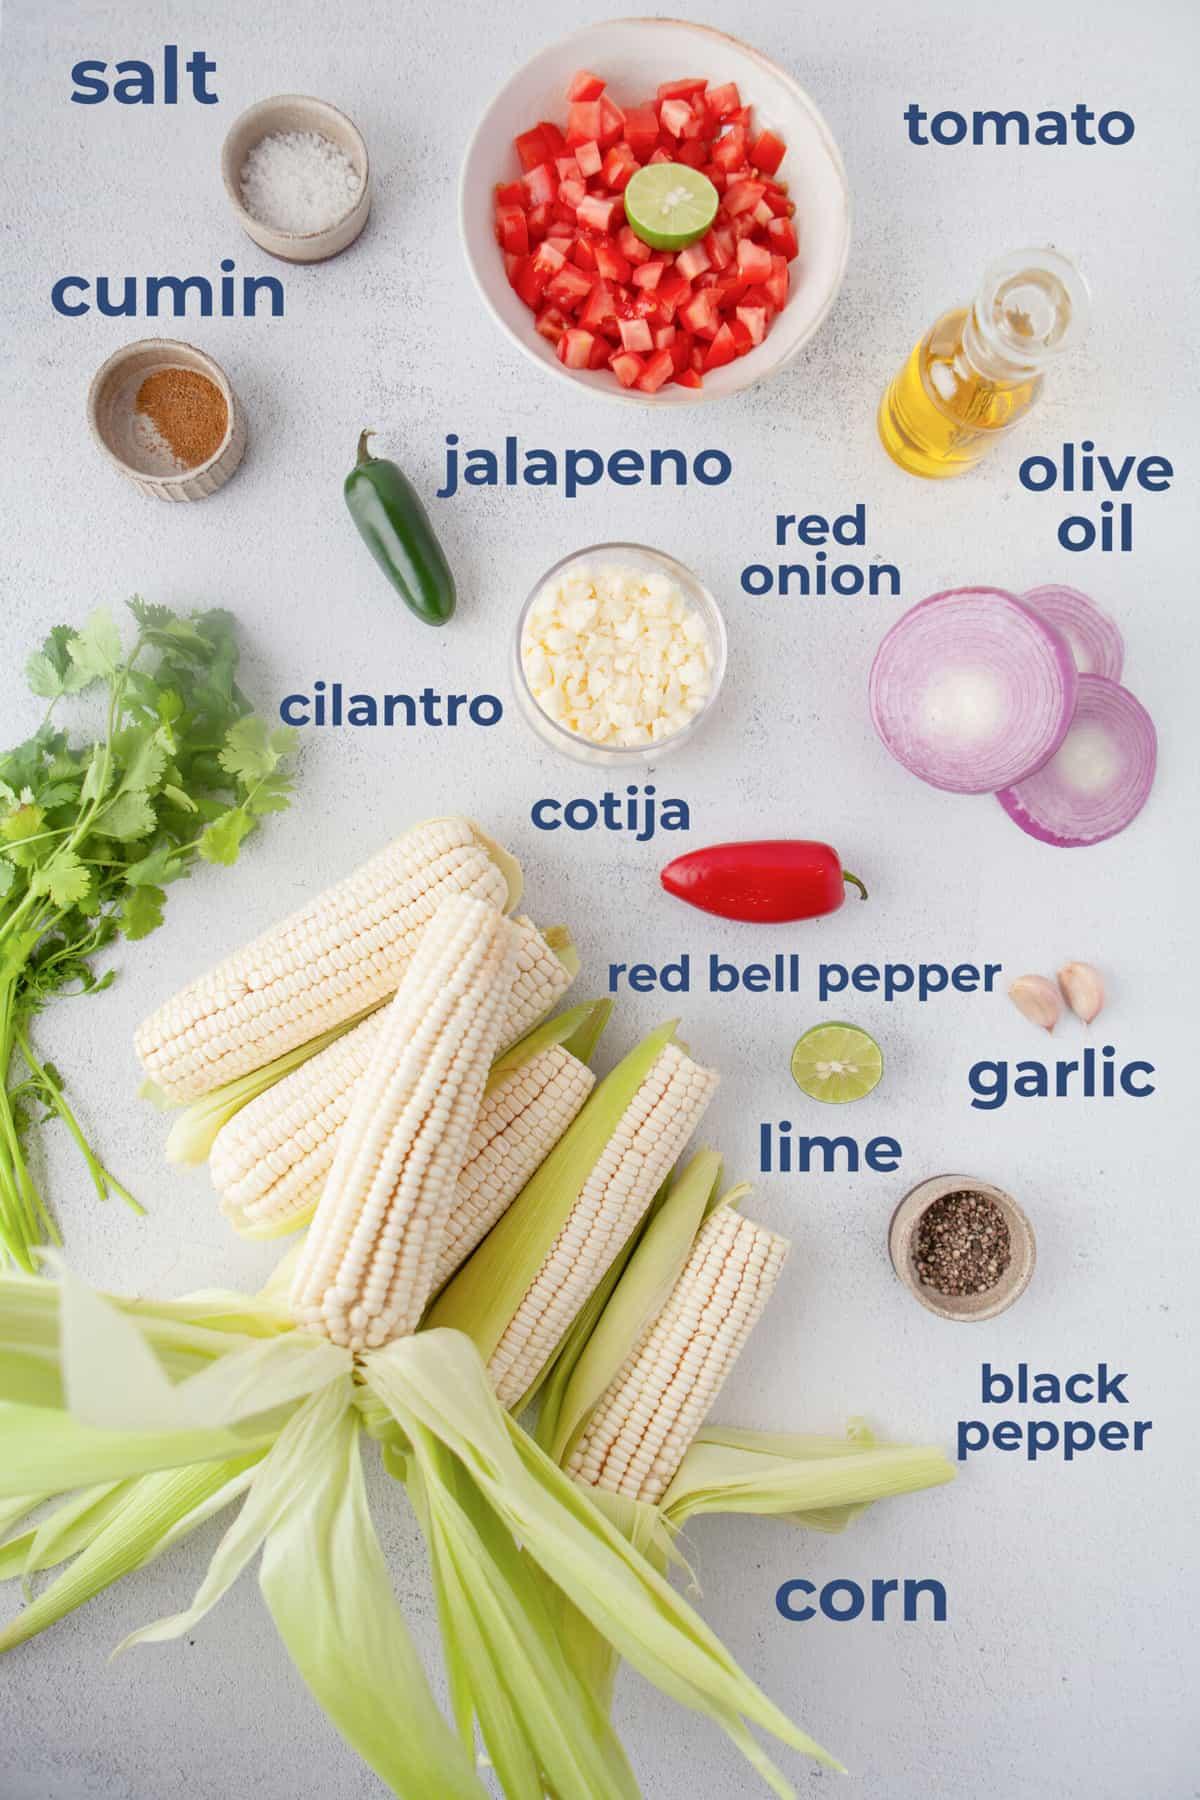 Ingredients for corn salsa - corn tomato, peppers, garlic, cheese, cilantro, limes, garlic cumin